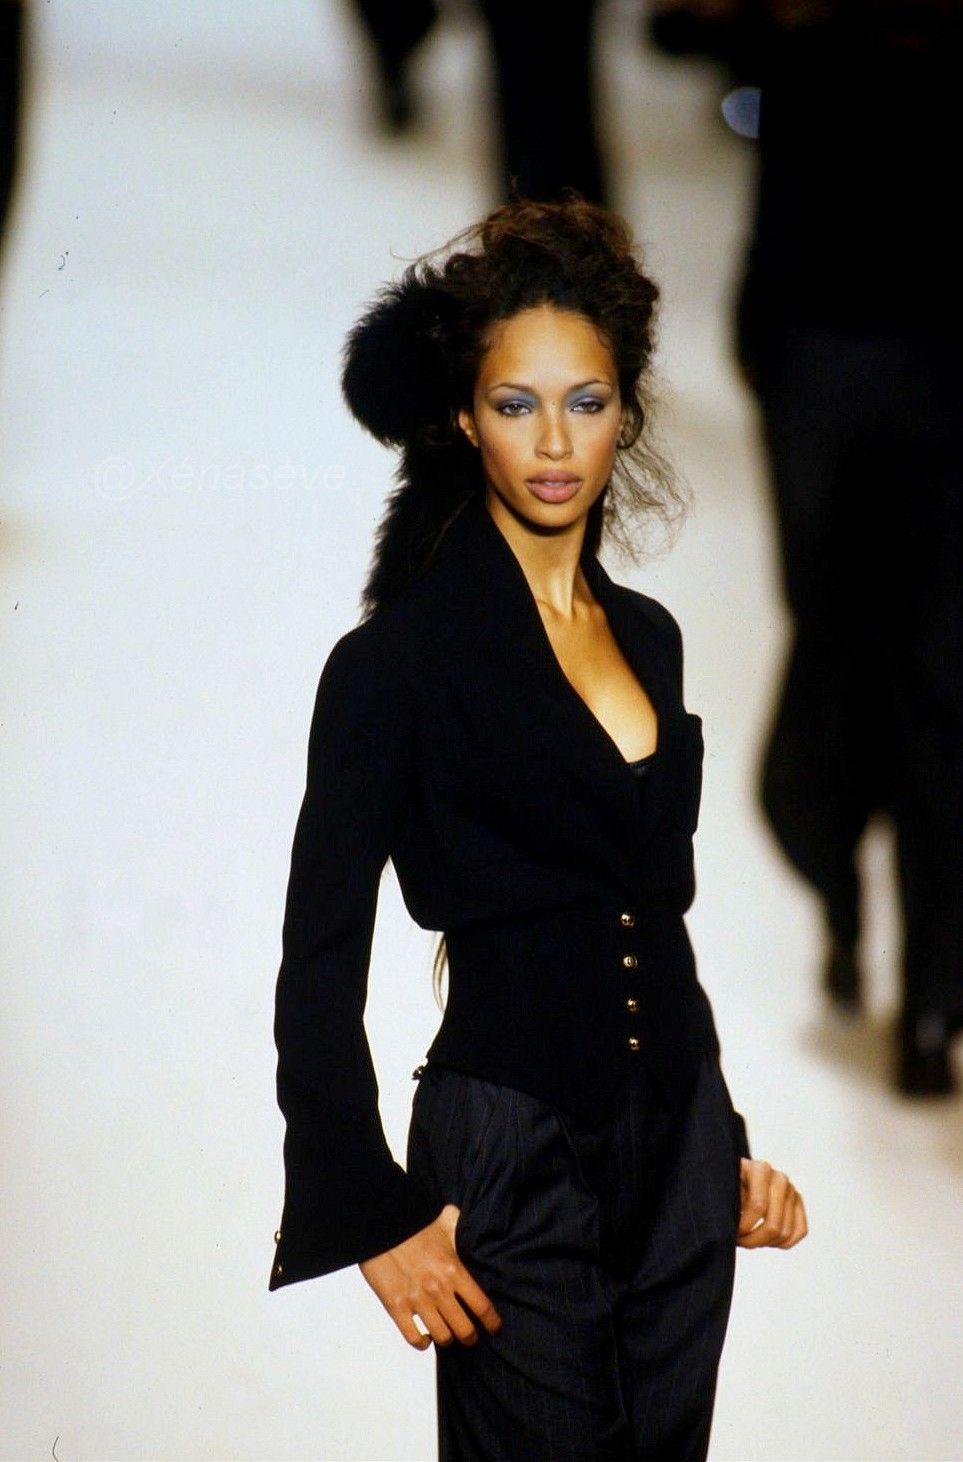 BRANDI QUINONES in 2019 | Fashion, Fashion design, Peplum dress